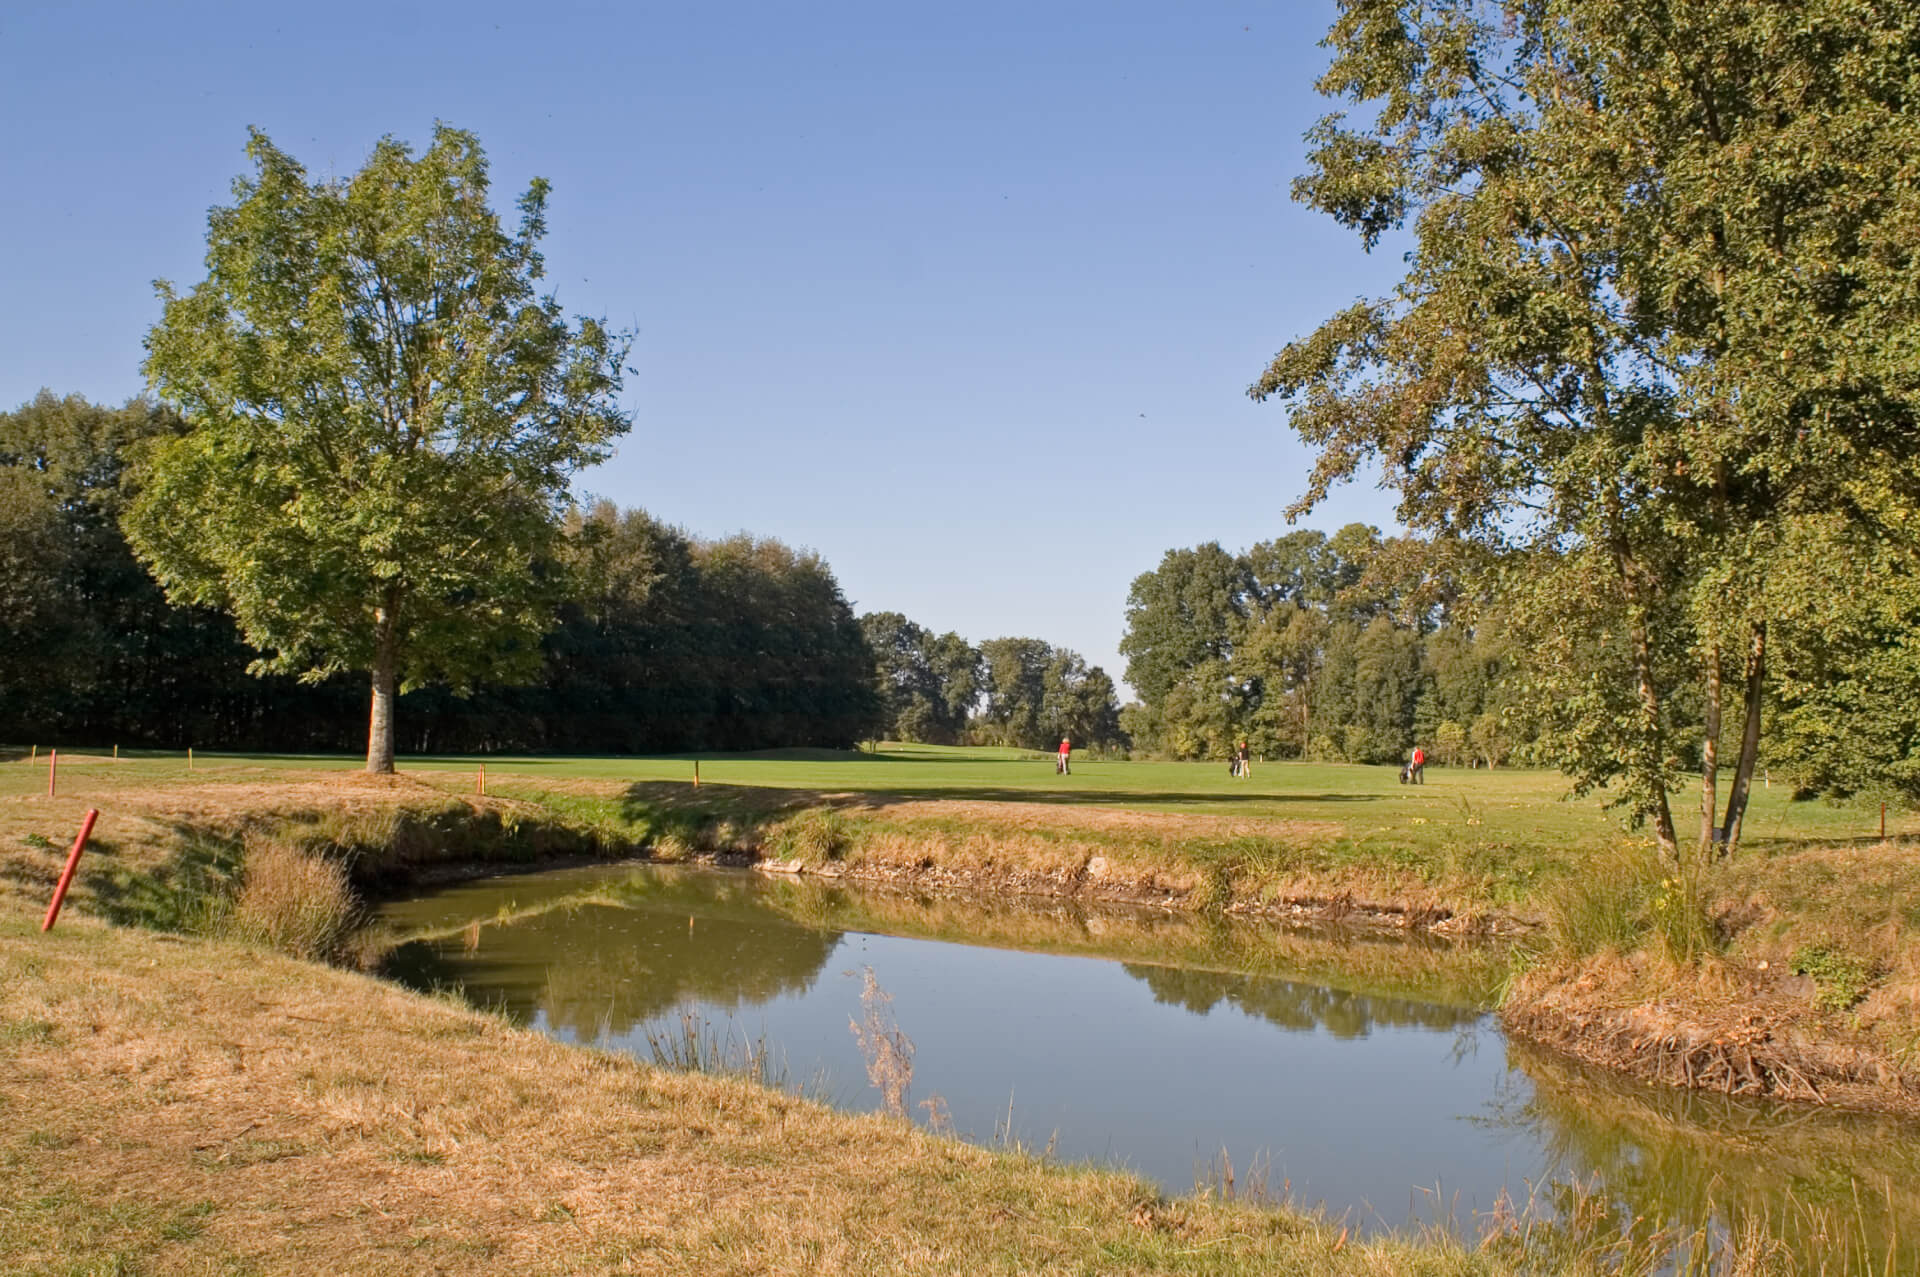 https://golfclub-peckeloh.de/wp-content/uploads/2018/02/PICT0287.jpg